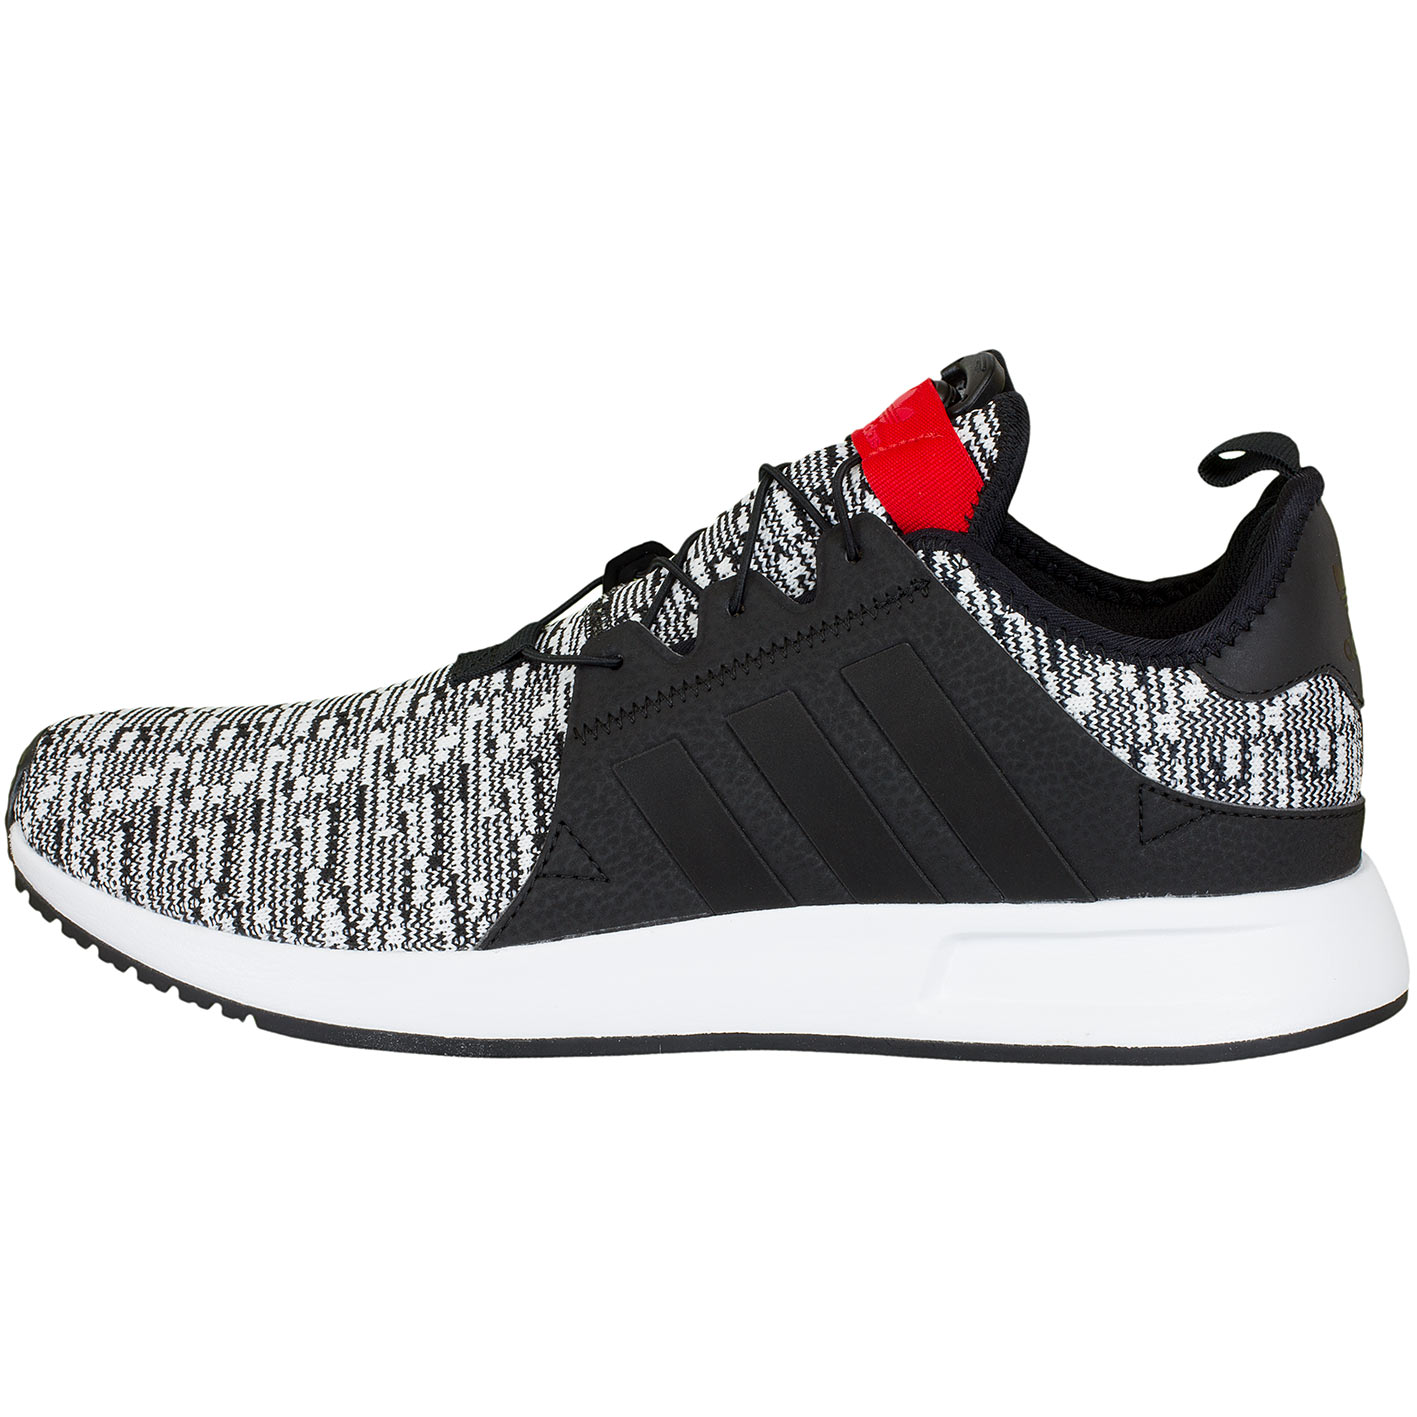 c2db65b11977e9 ☆ Adidas Originals Sneaker X PLR schwarz schwarz rot - hier bestellen!